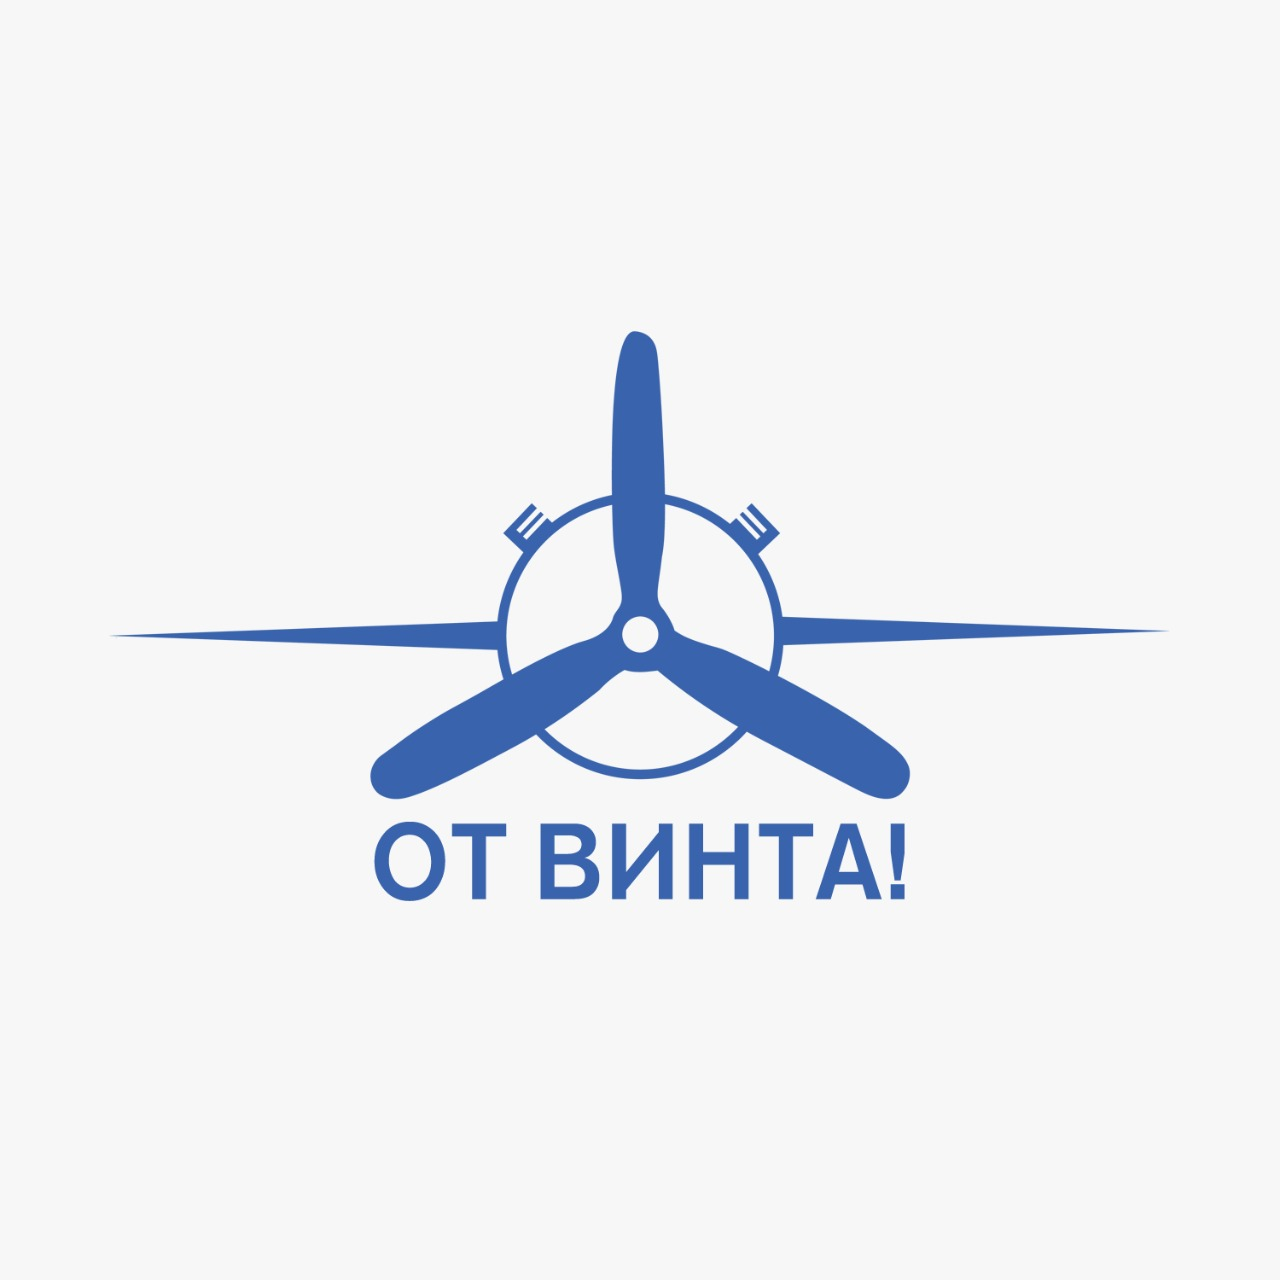 По инициативе фестиваля «От Винта!» Стамбул и Москва начнут молодежное инновационное сотрудничество